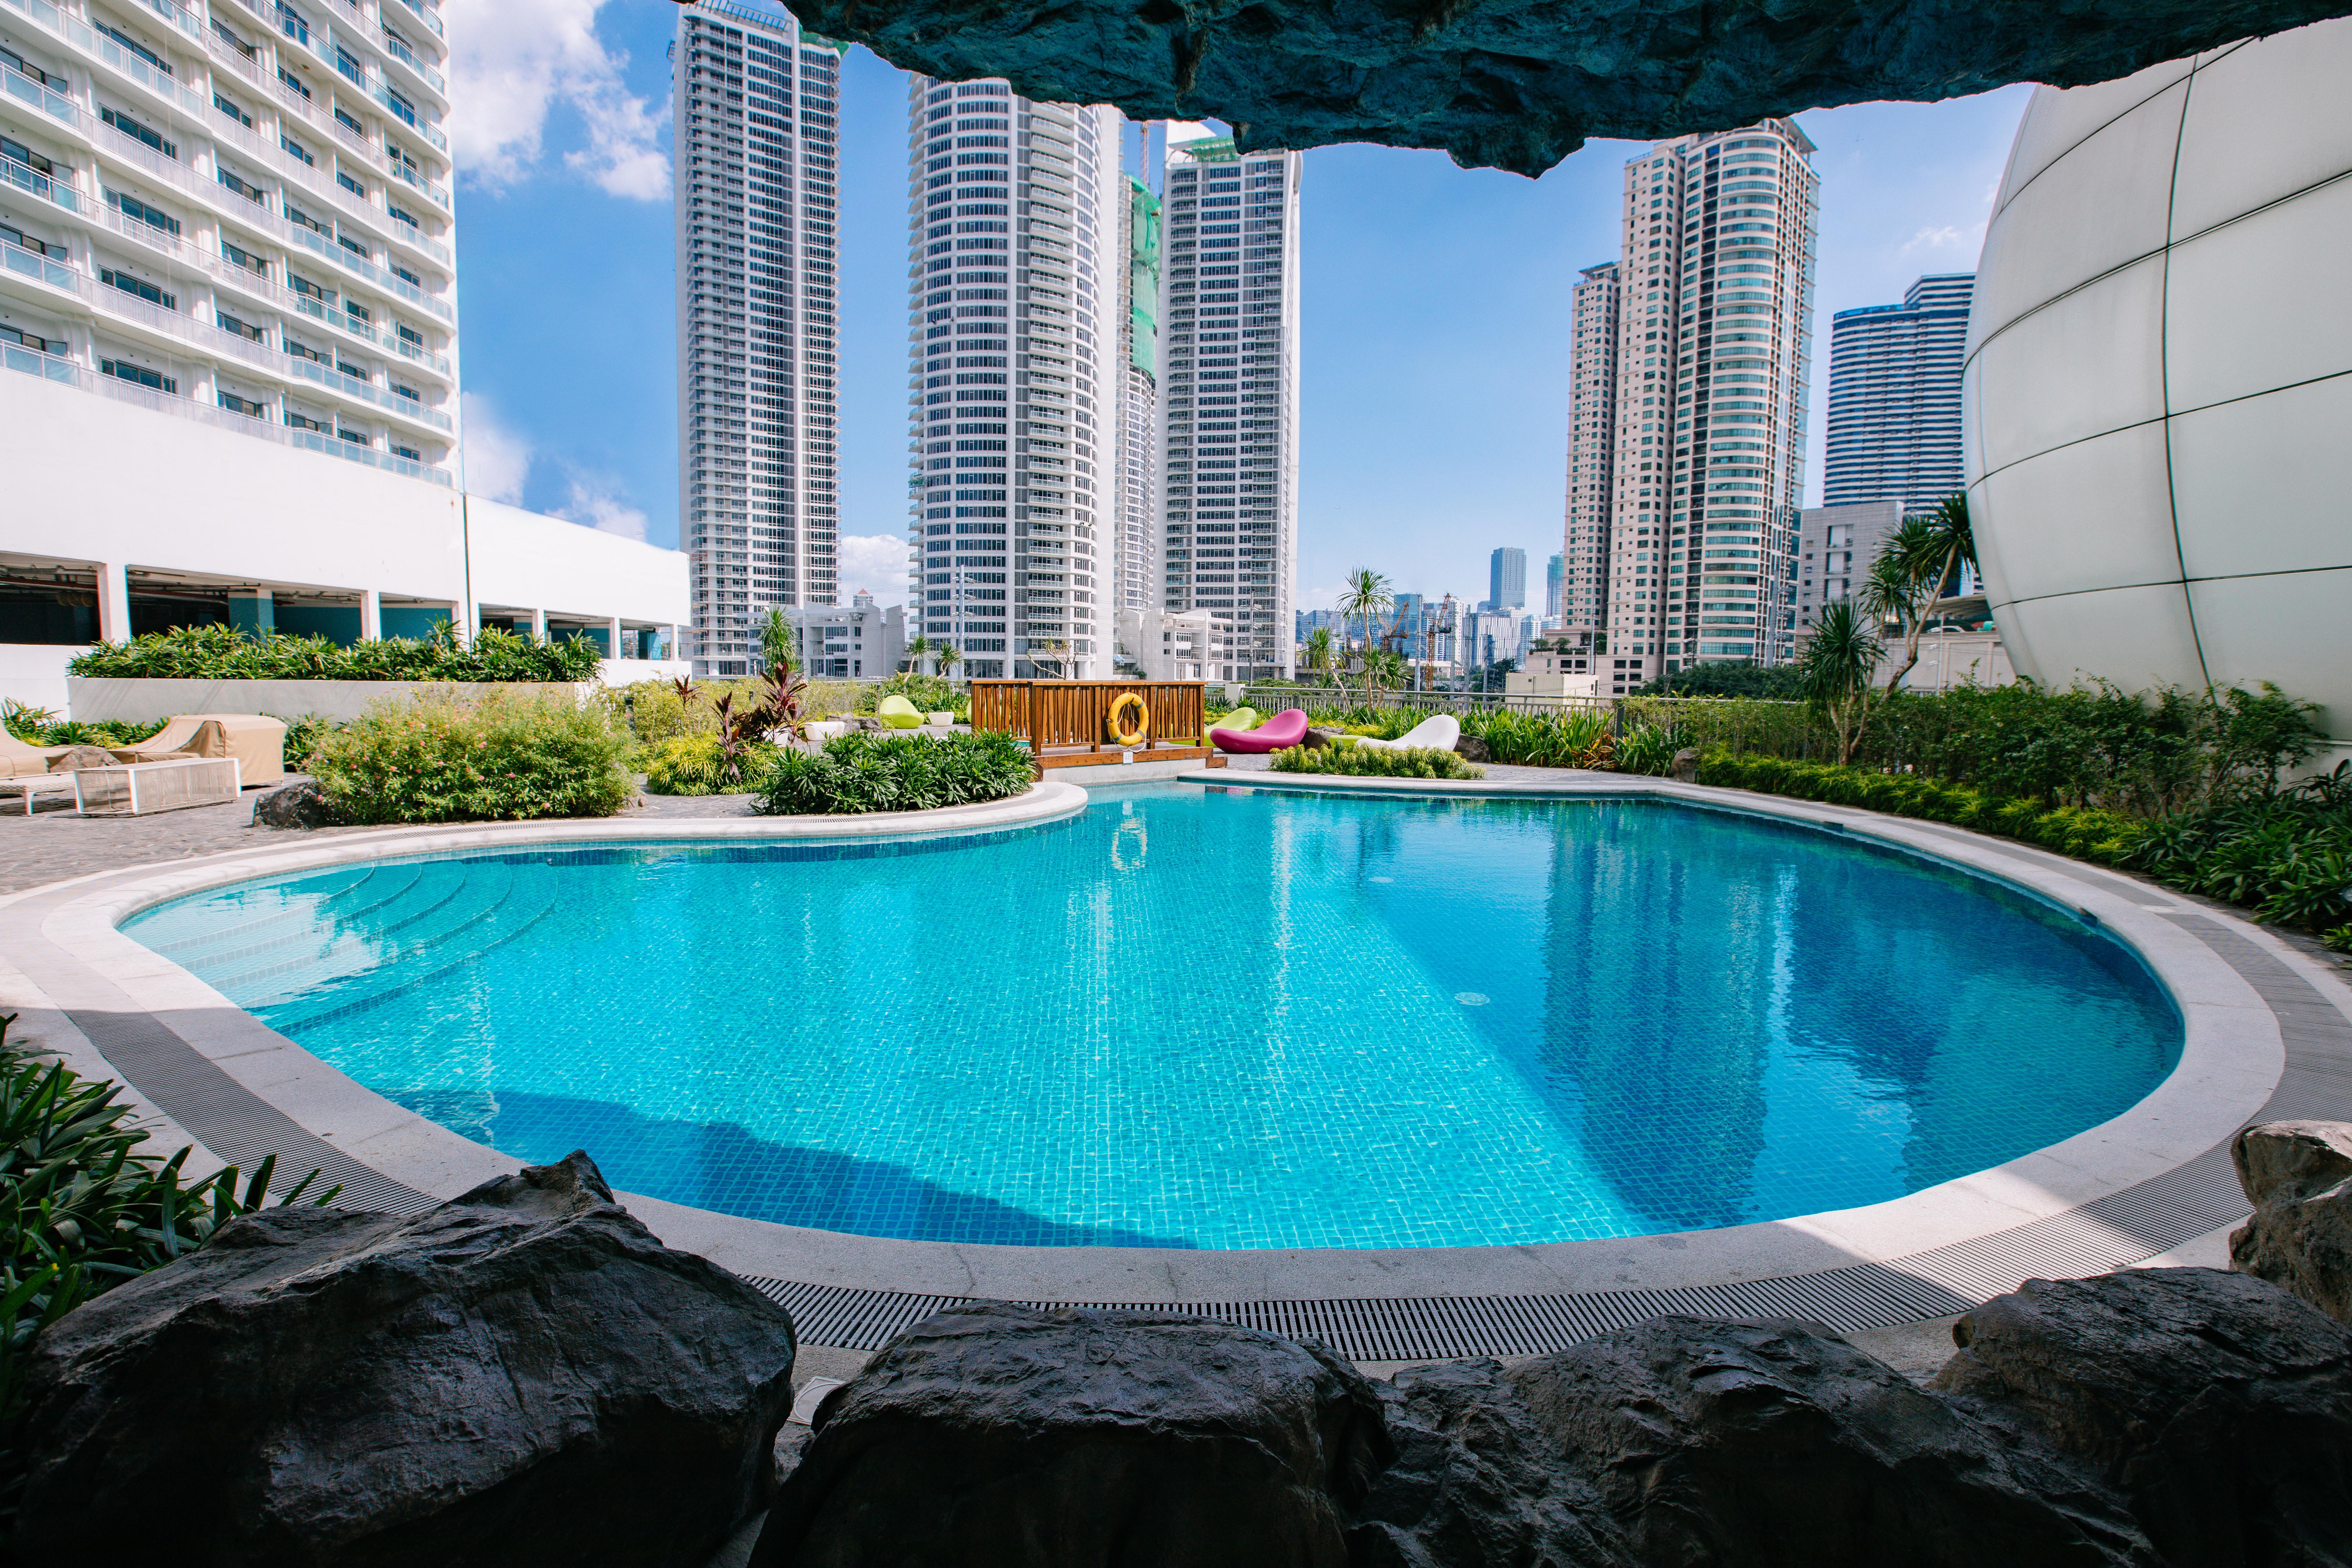 pool area at acqua private residences